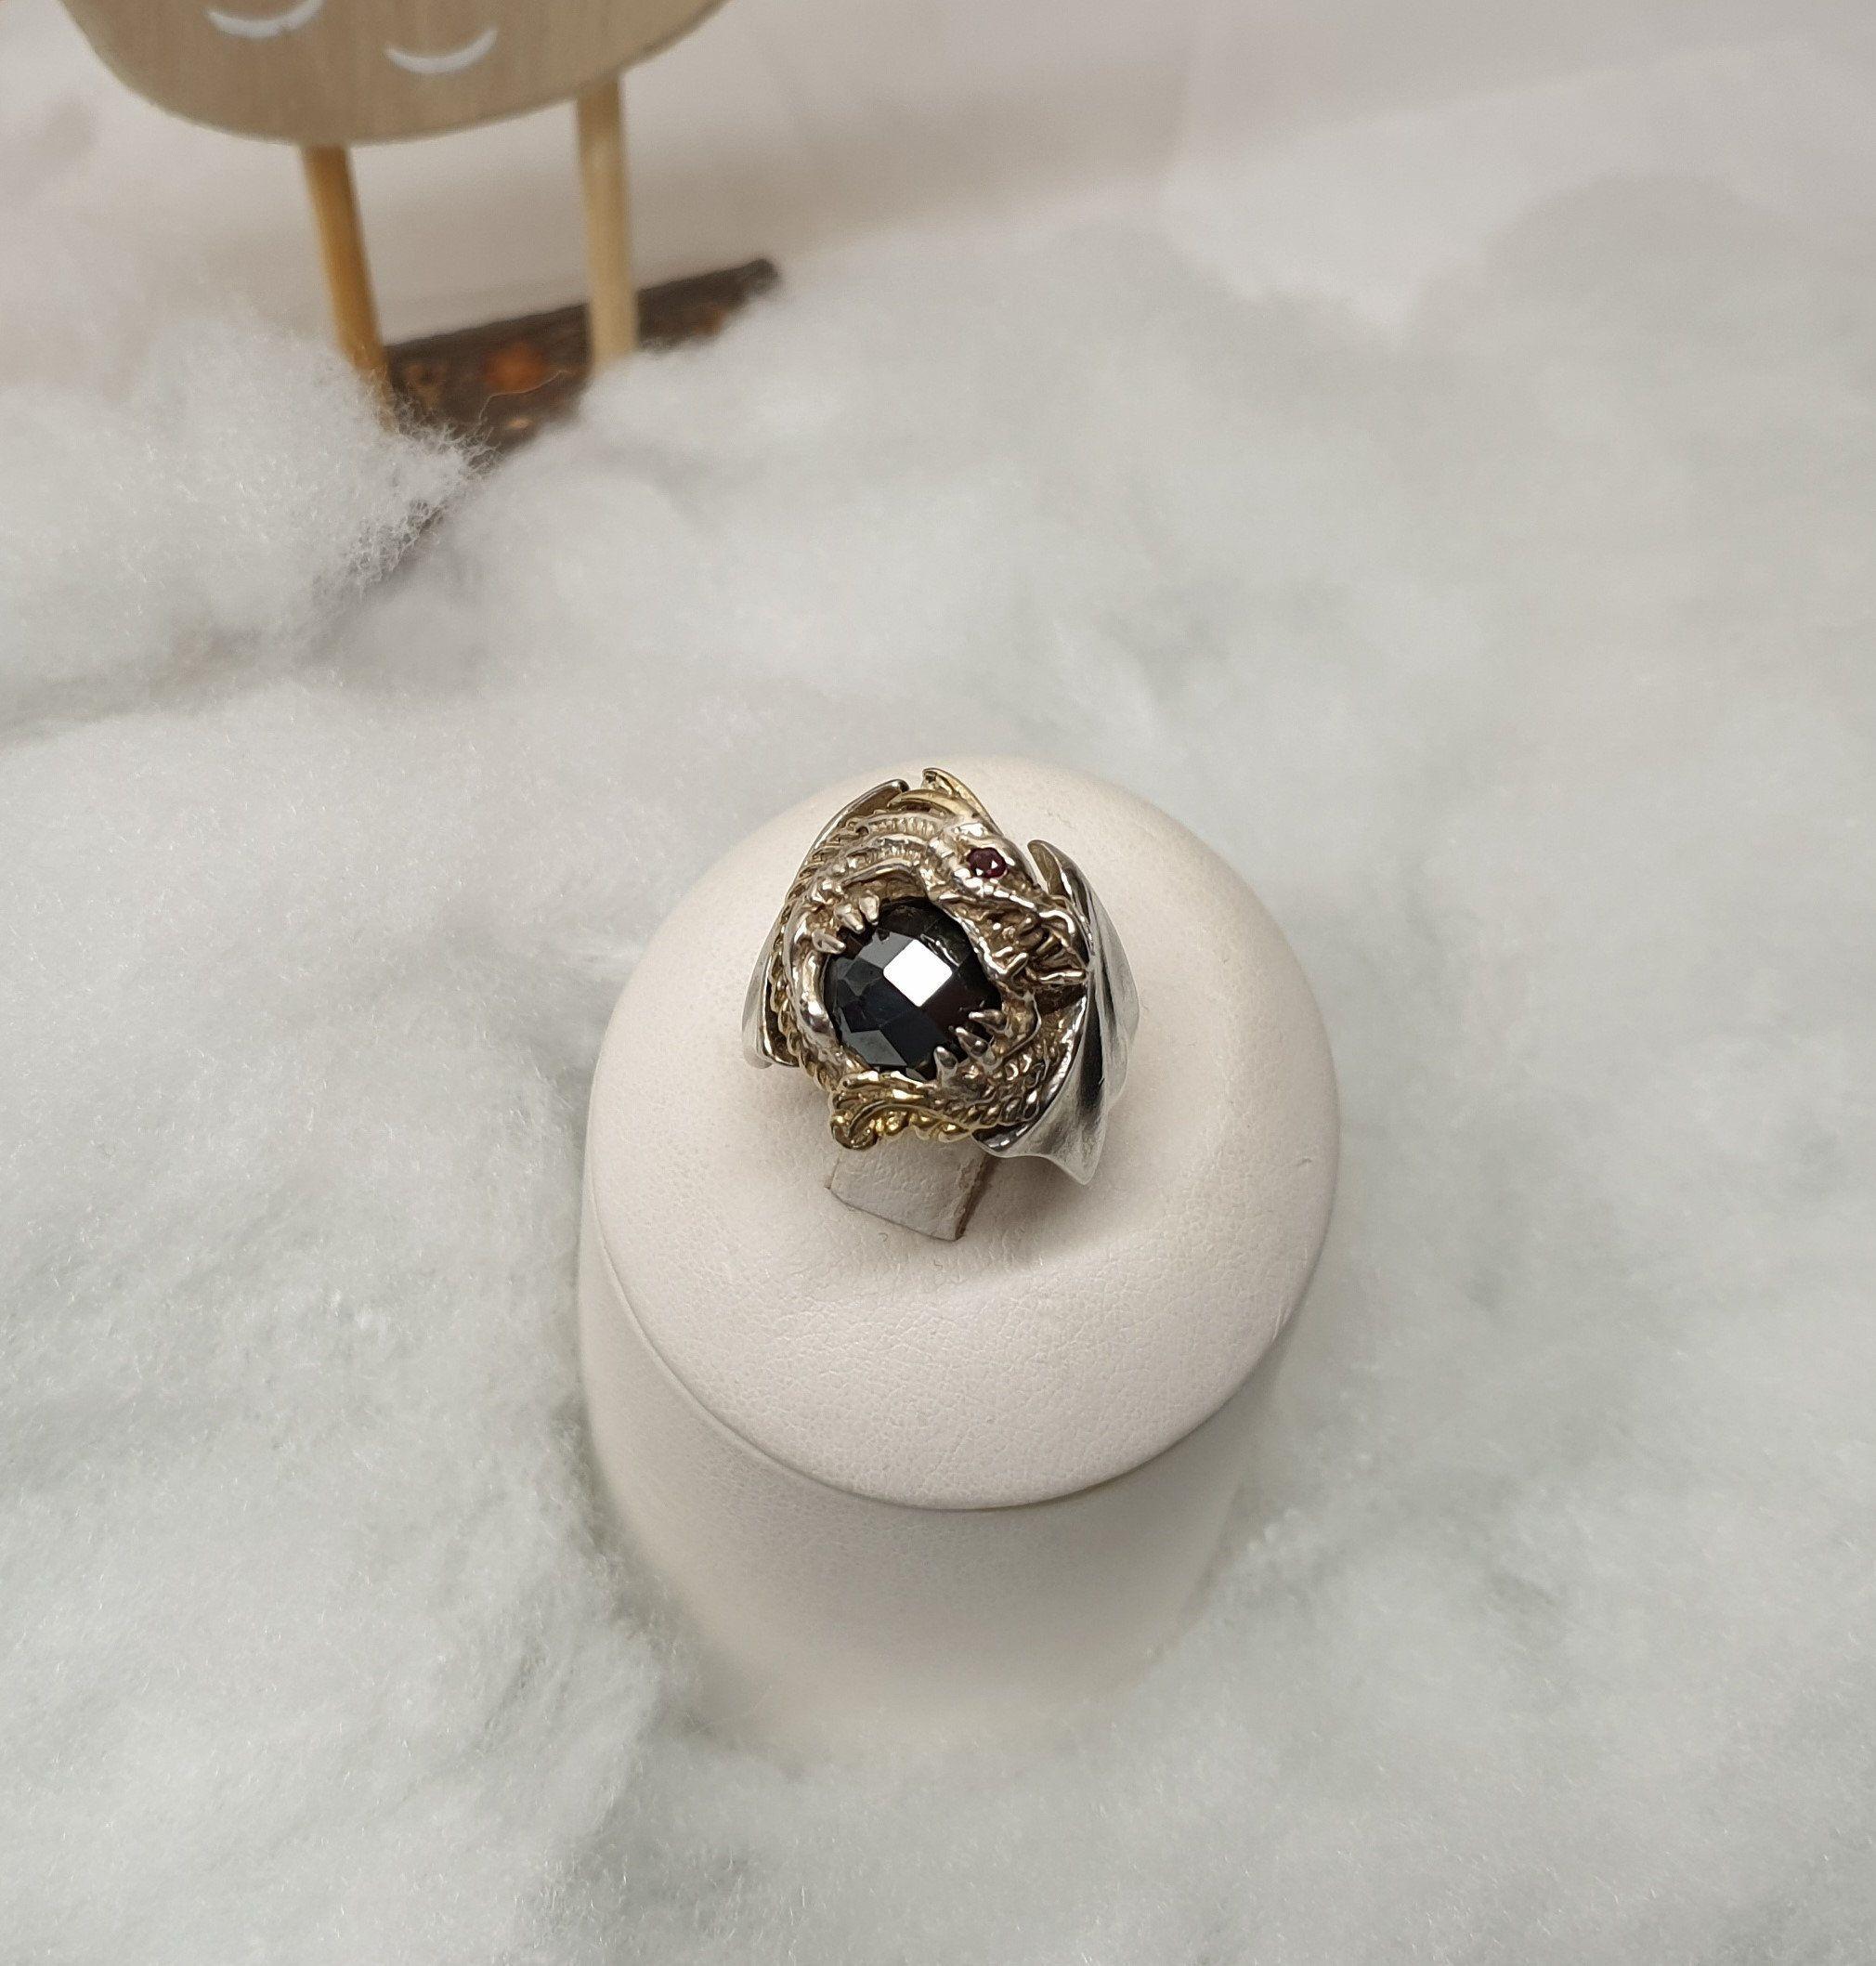 Schützender Talisman          VERSCHIEDENE GRÖßEN Atlanten Ring aus Silber 925